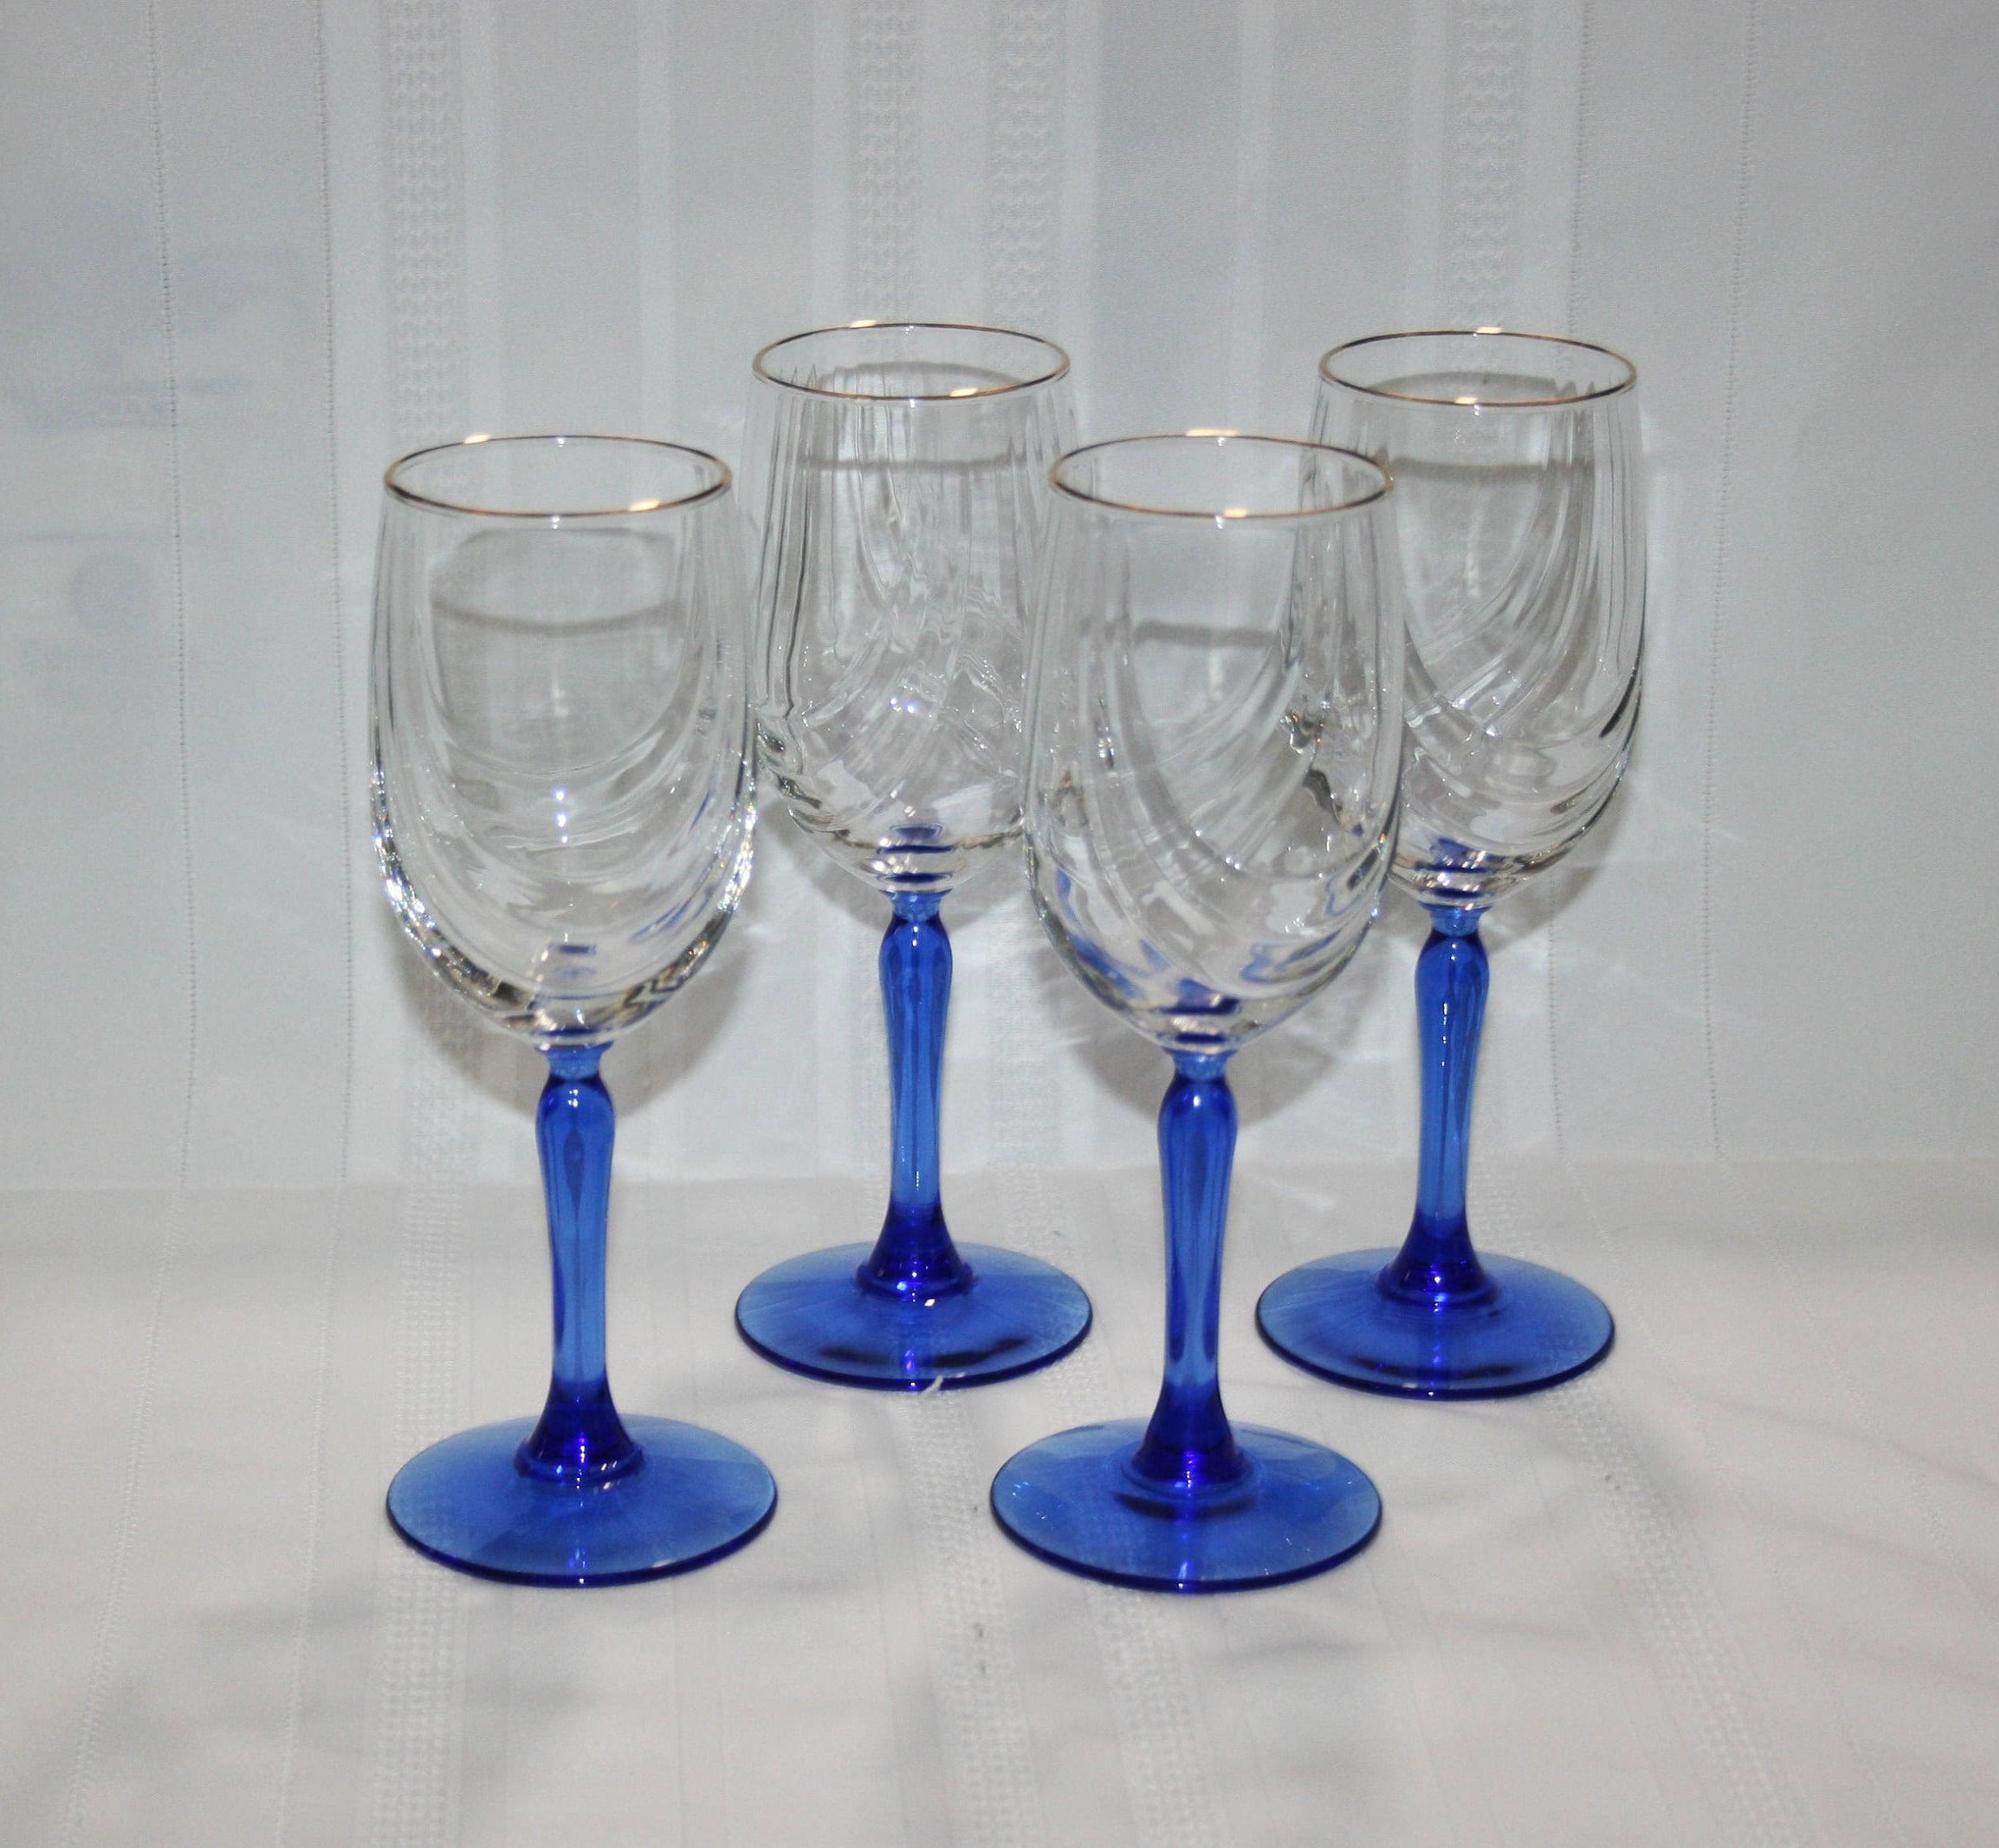 Vintage lenox crystal wine glass cobalt blue stemmed dual swag vintage lenox crystal wine glass cobalt blue stemmed dual swag draped gold rim glasses set of 4 bar barware stemware wedding party reviewsmspy